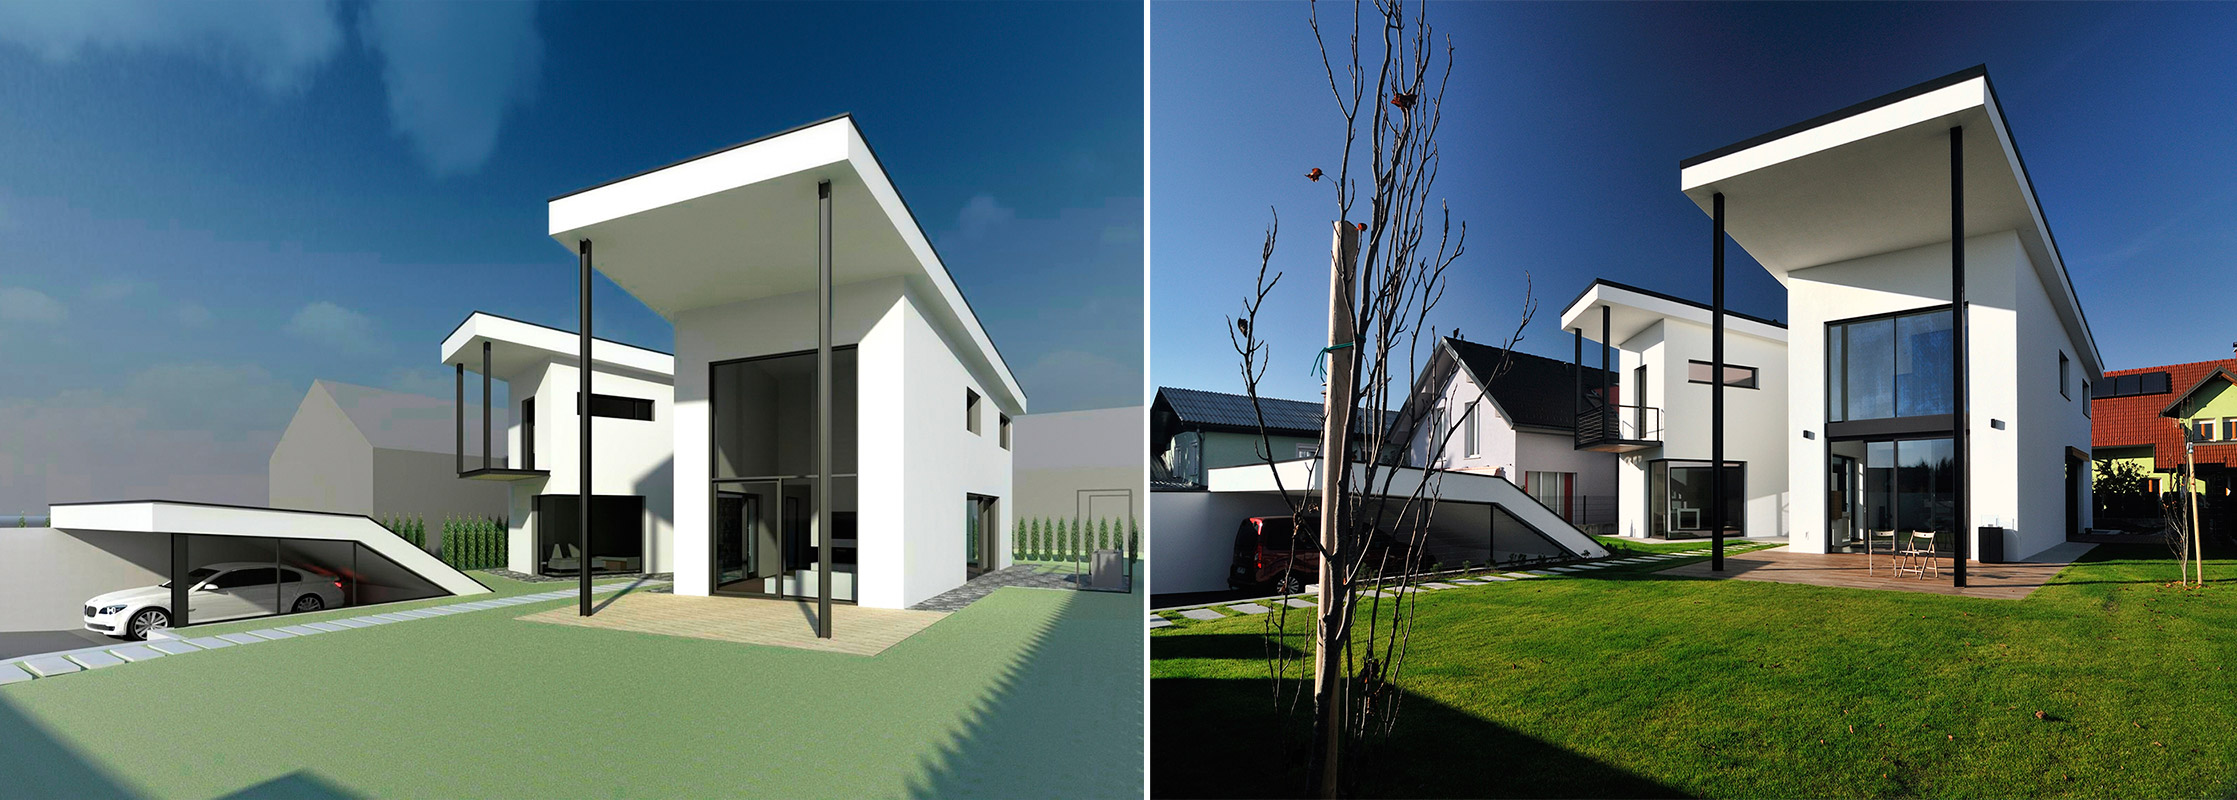 levo: 3D hitra vizualizacija v fazi idejne zasnove / desno: izvedeno stanja